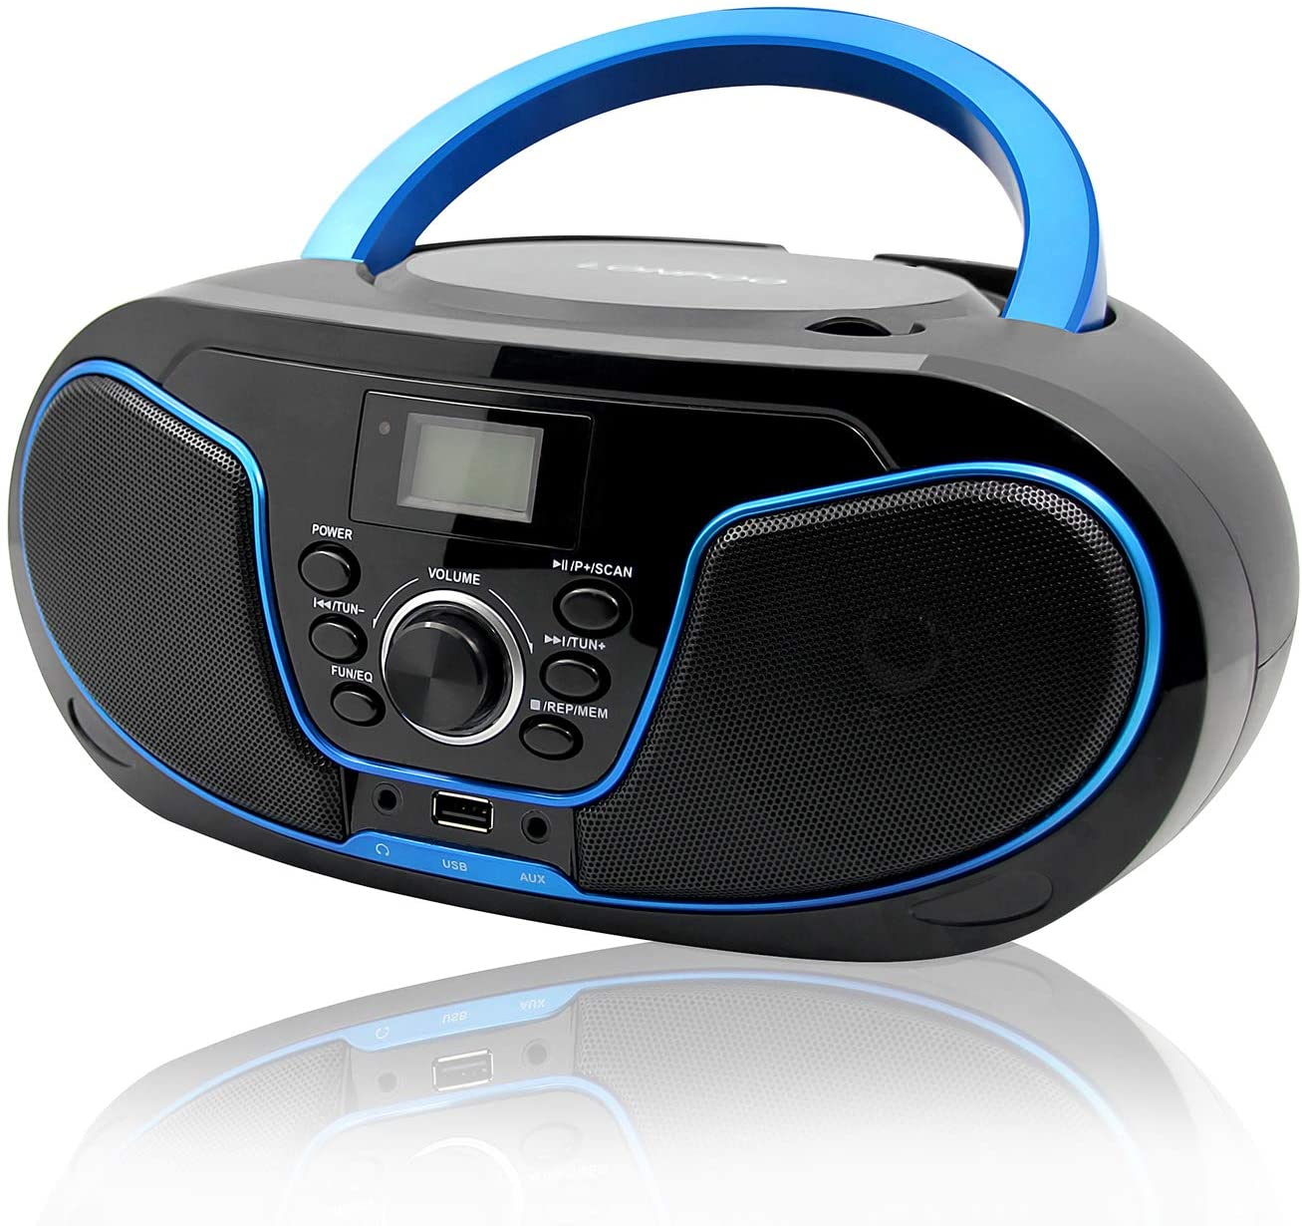 LONPOO Portátil Bluetooth Reproductor de CD Boombox 4W (FM Radio, Reproductor de CD / MP3, USB2.0, AUX-IN, Bluetooth4.0)